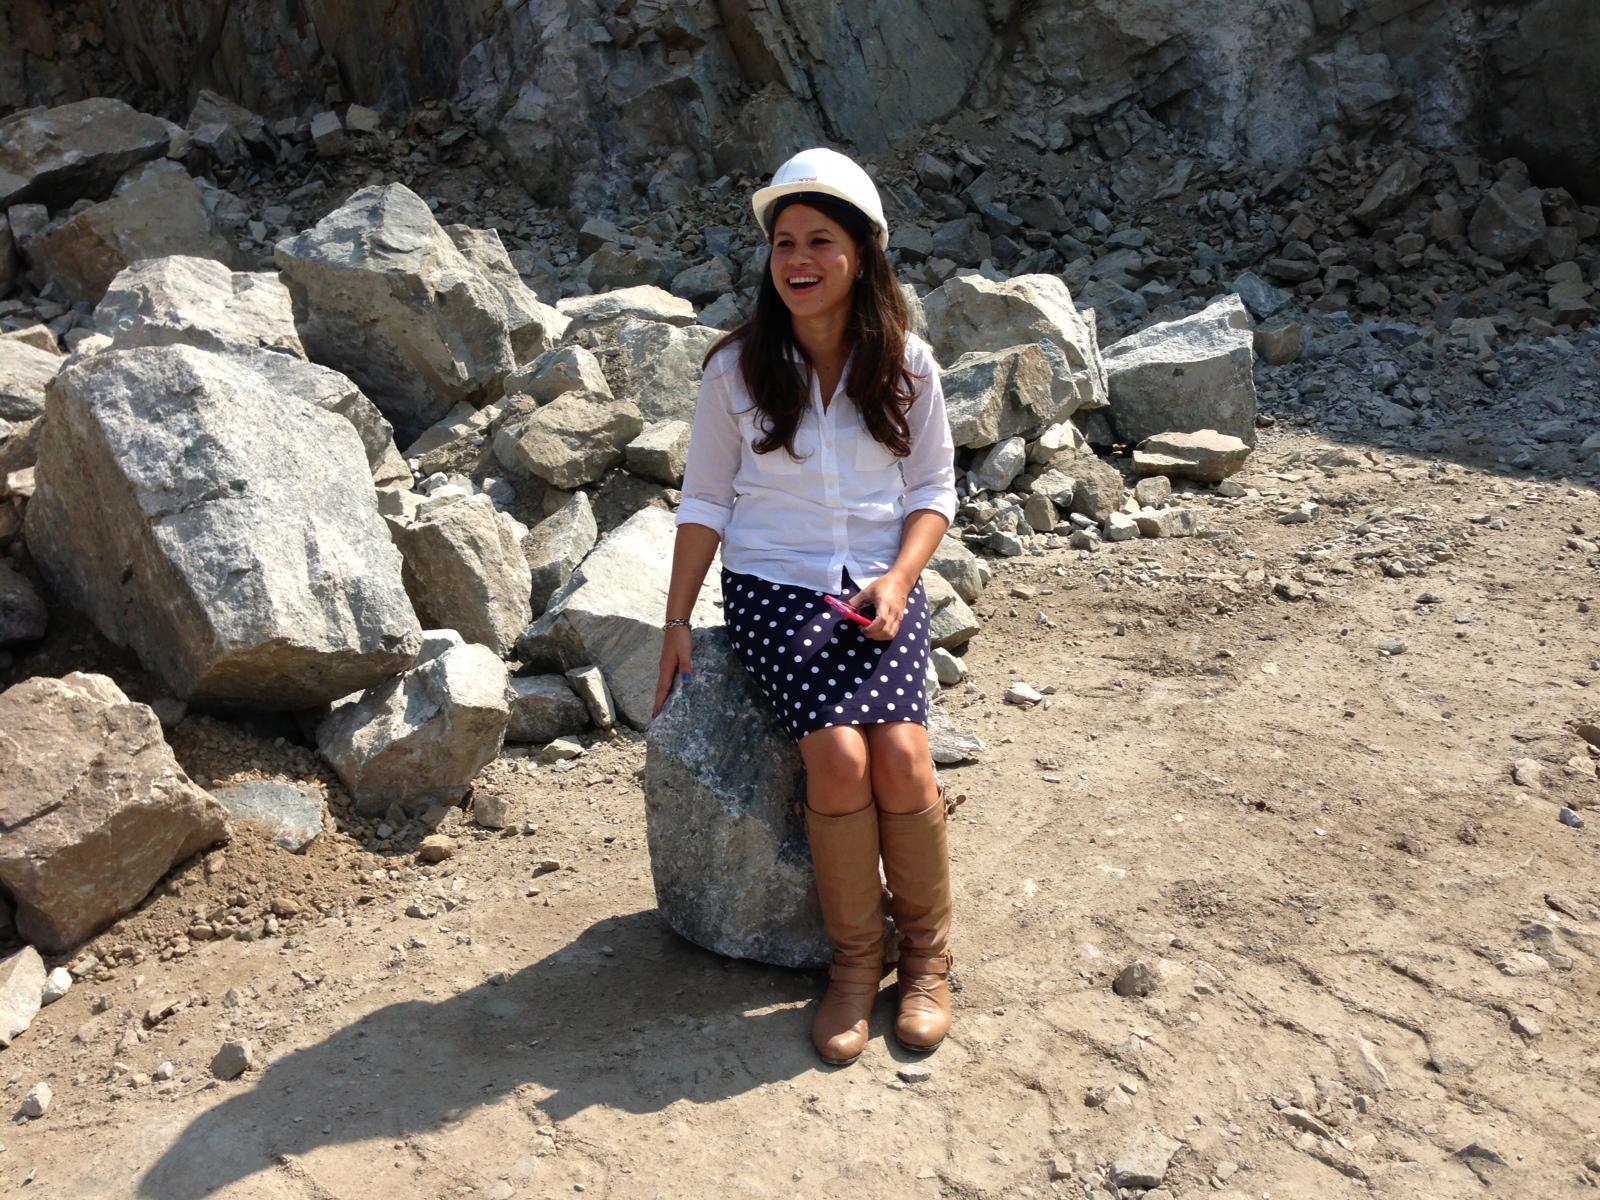 Diana is a fan of the granite boulders.